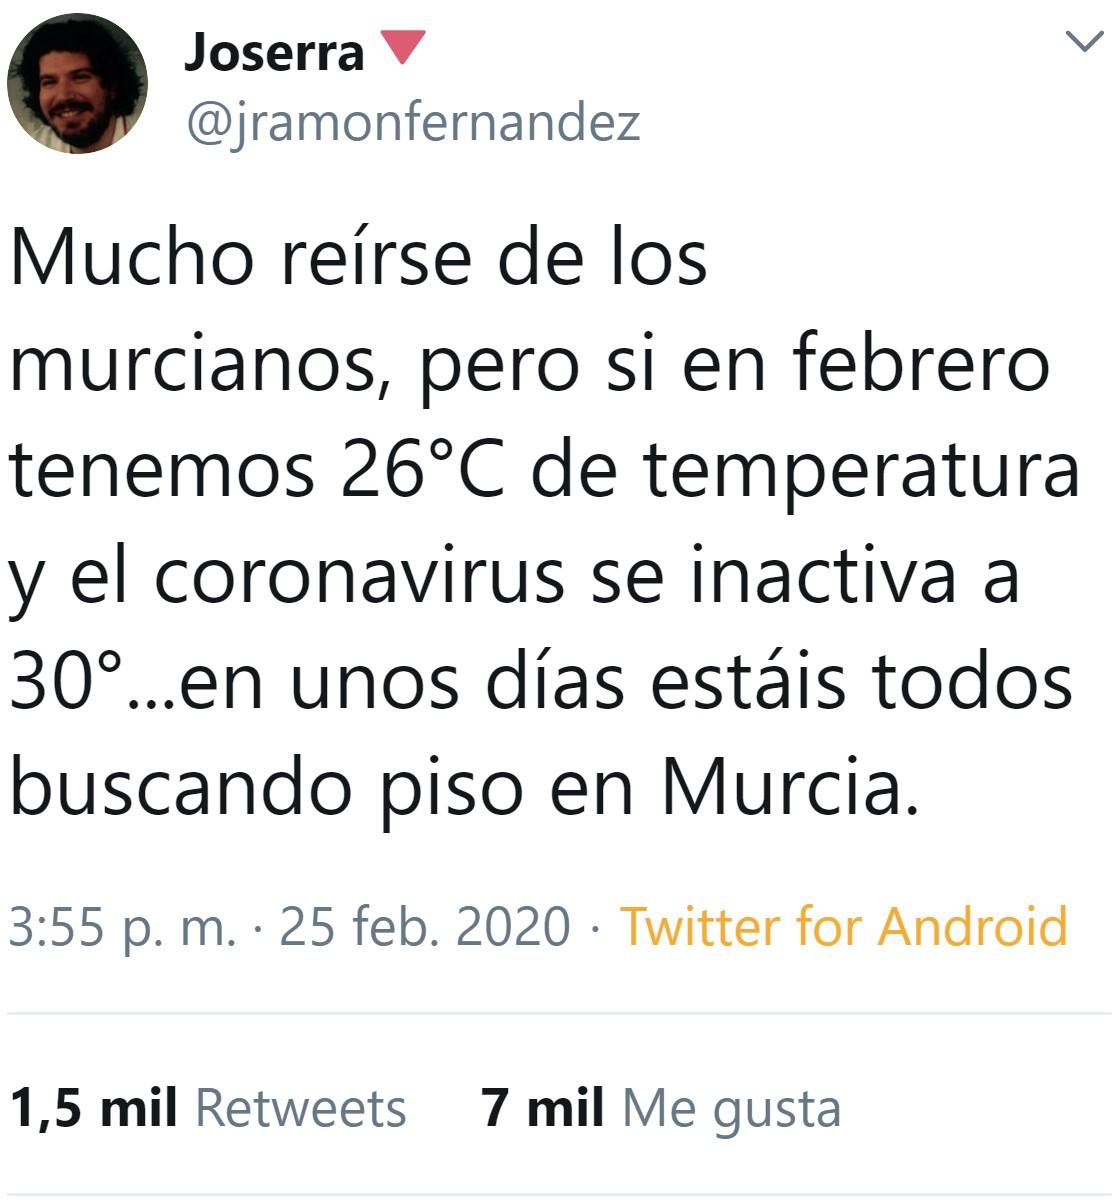 Reíros, pero en unos meses Murcia nueva capital de España por supervivencia